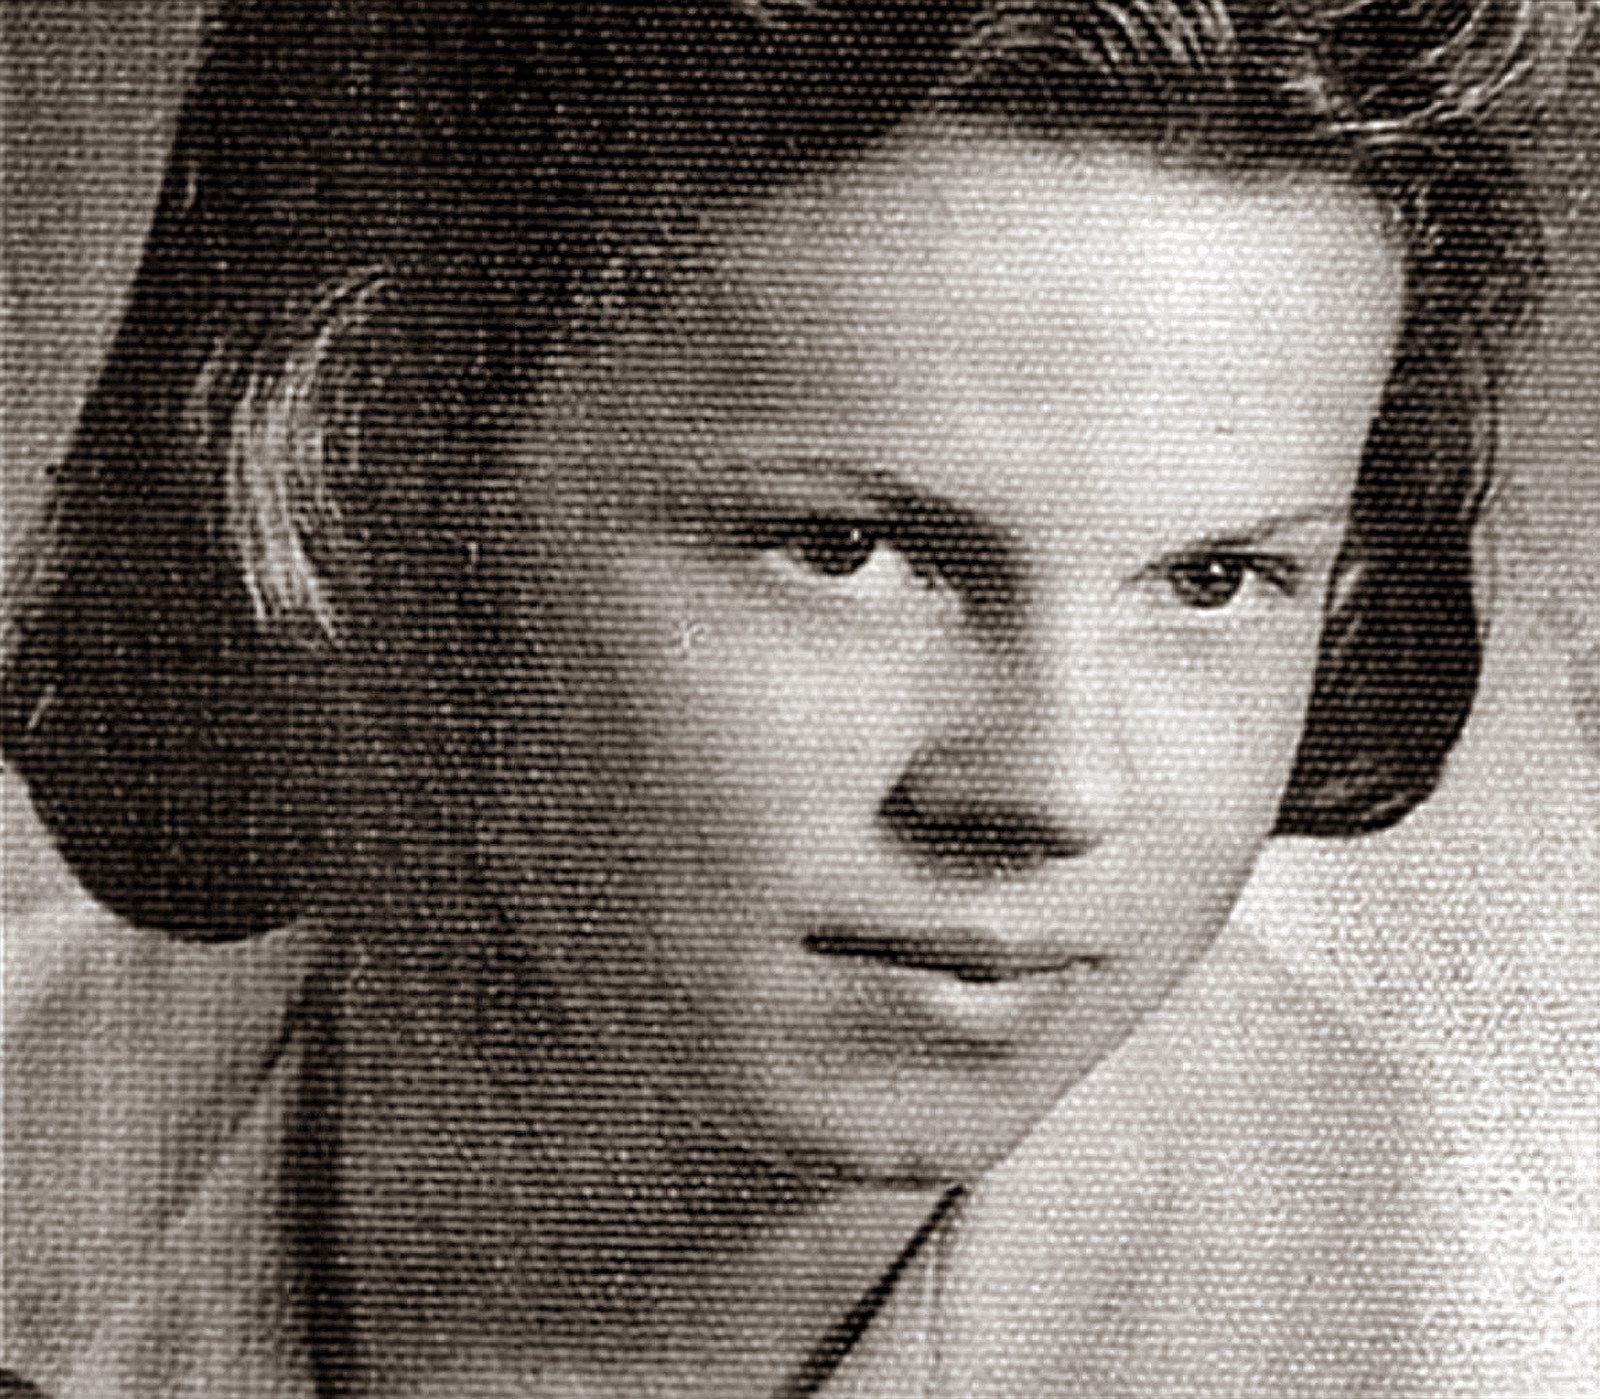 Roz Kelly,Marita Zobel (b. 1941) Erotic videos Valerie Tian,Michelle Kearley